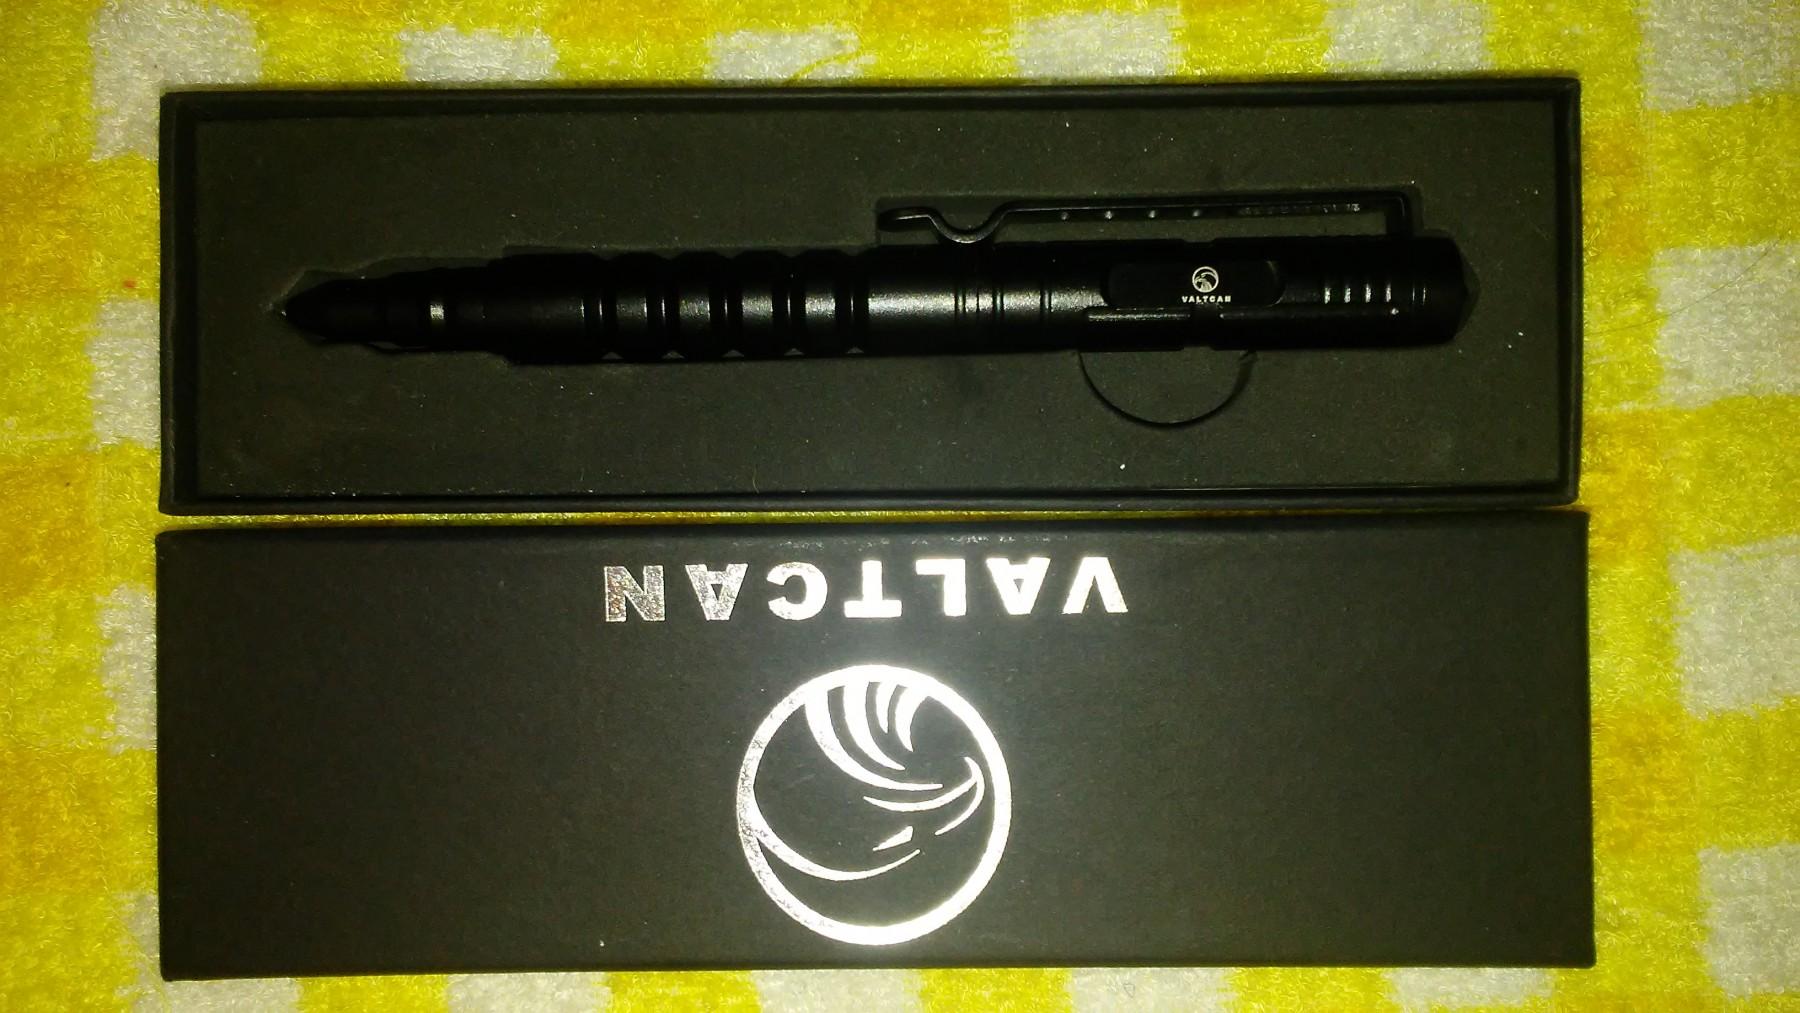 Nice tactical pen